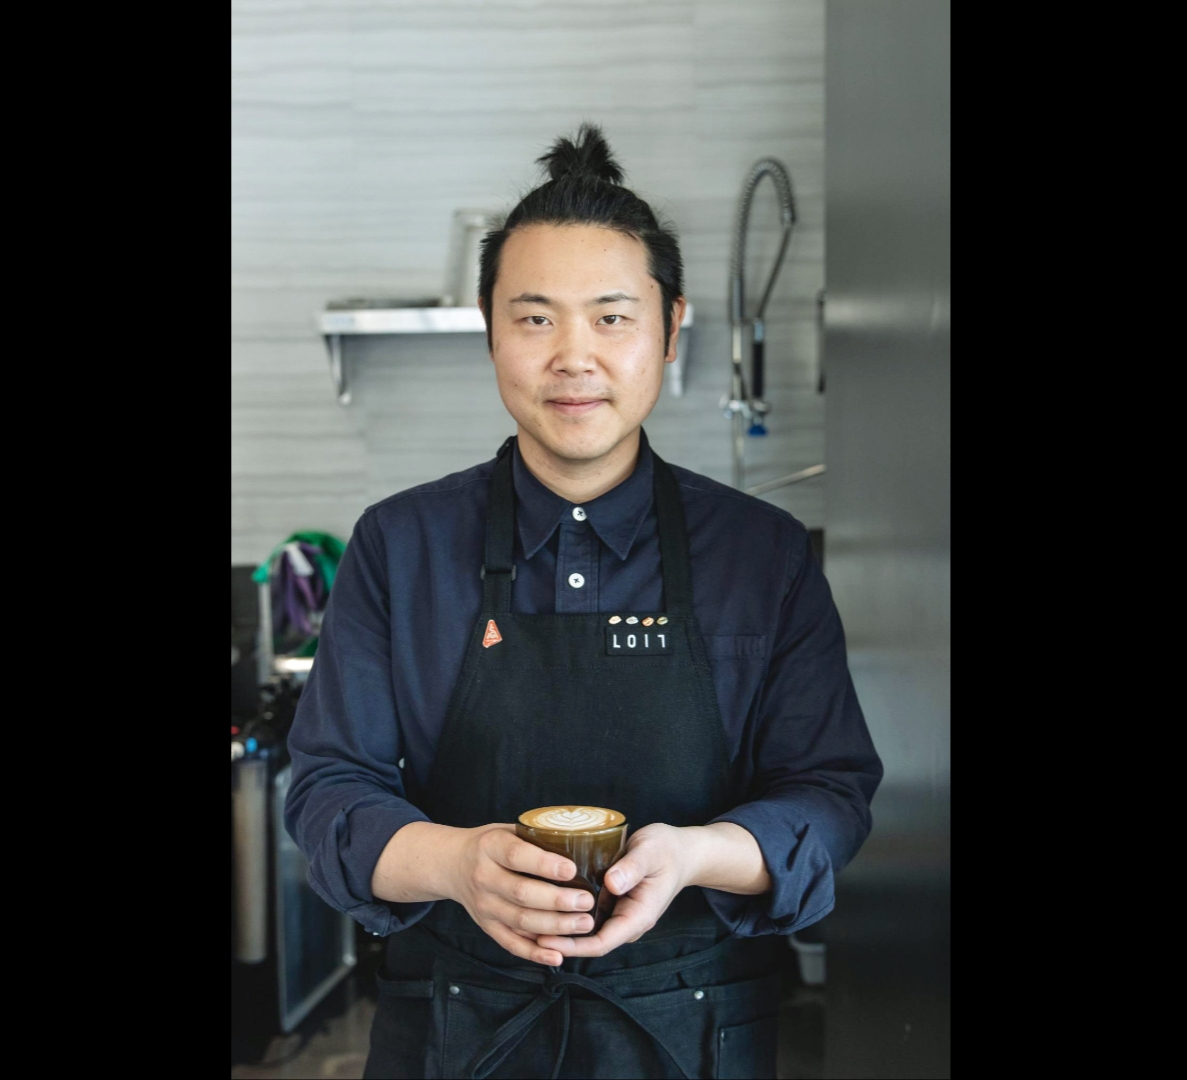 Hyoung Wuk (Luke) Jung   Loit Cafe – Los Angeles, CA